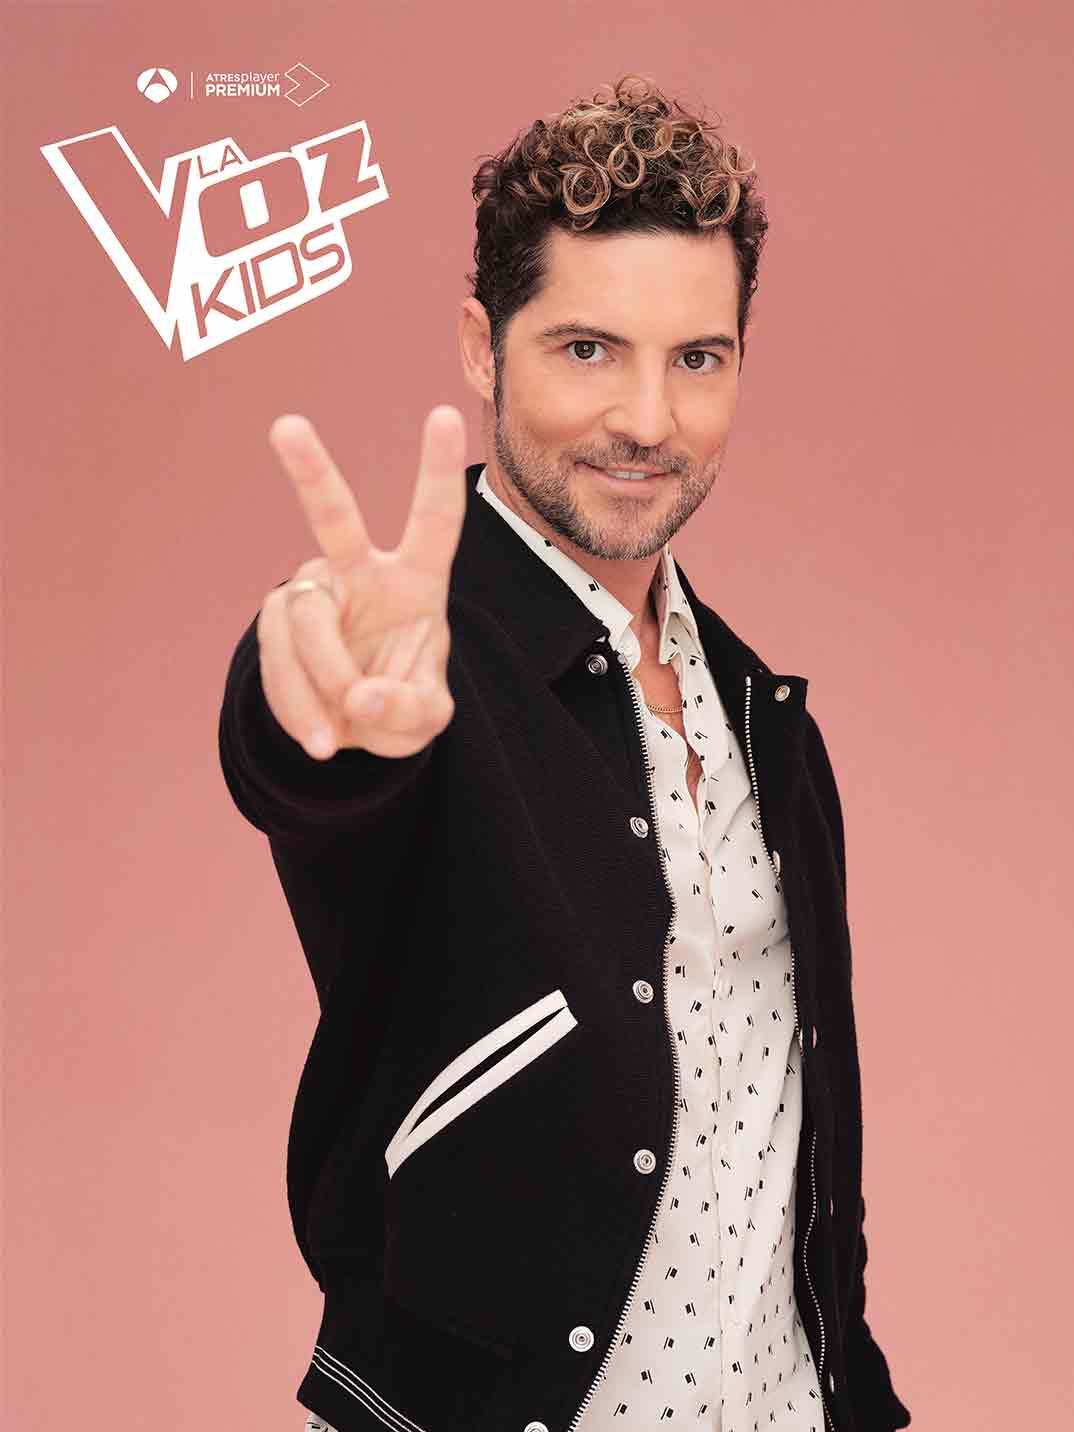 David Bisbal - La Voz Kids © Antena 3